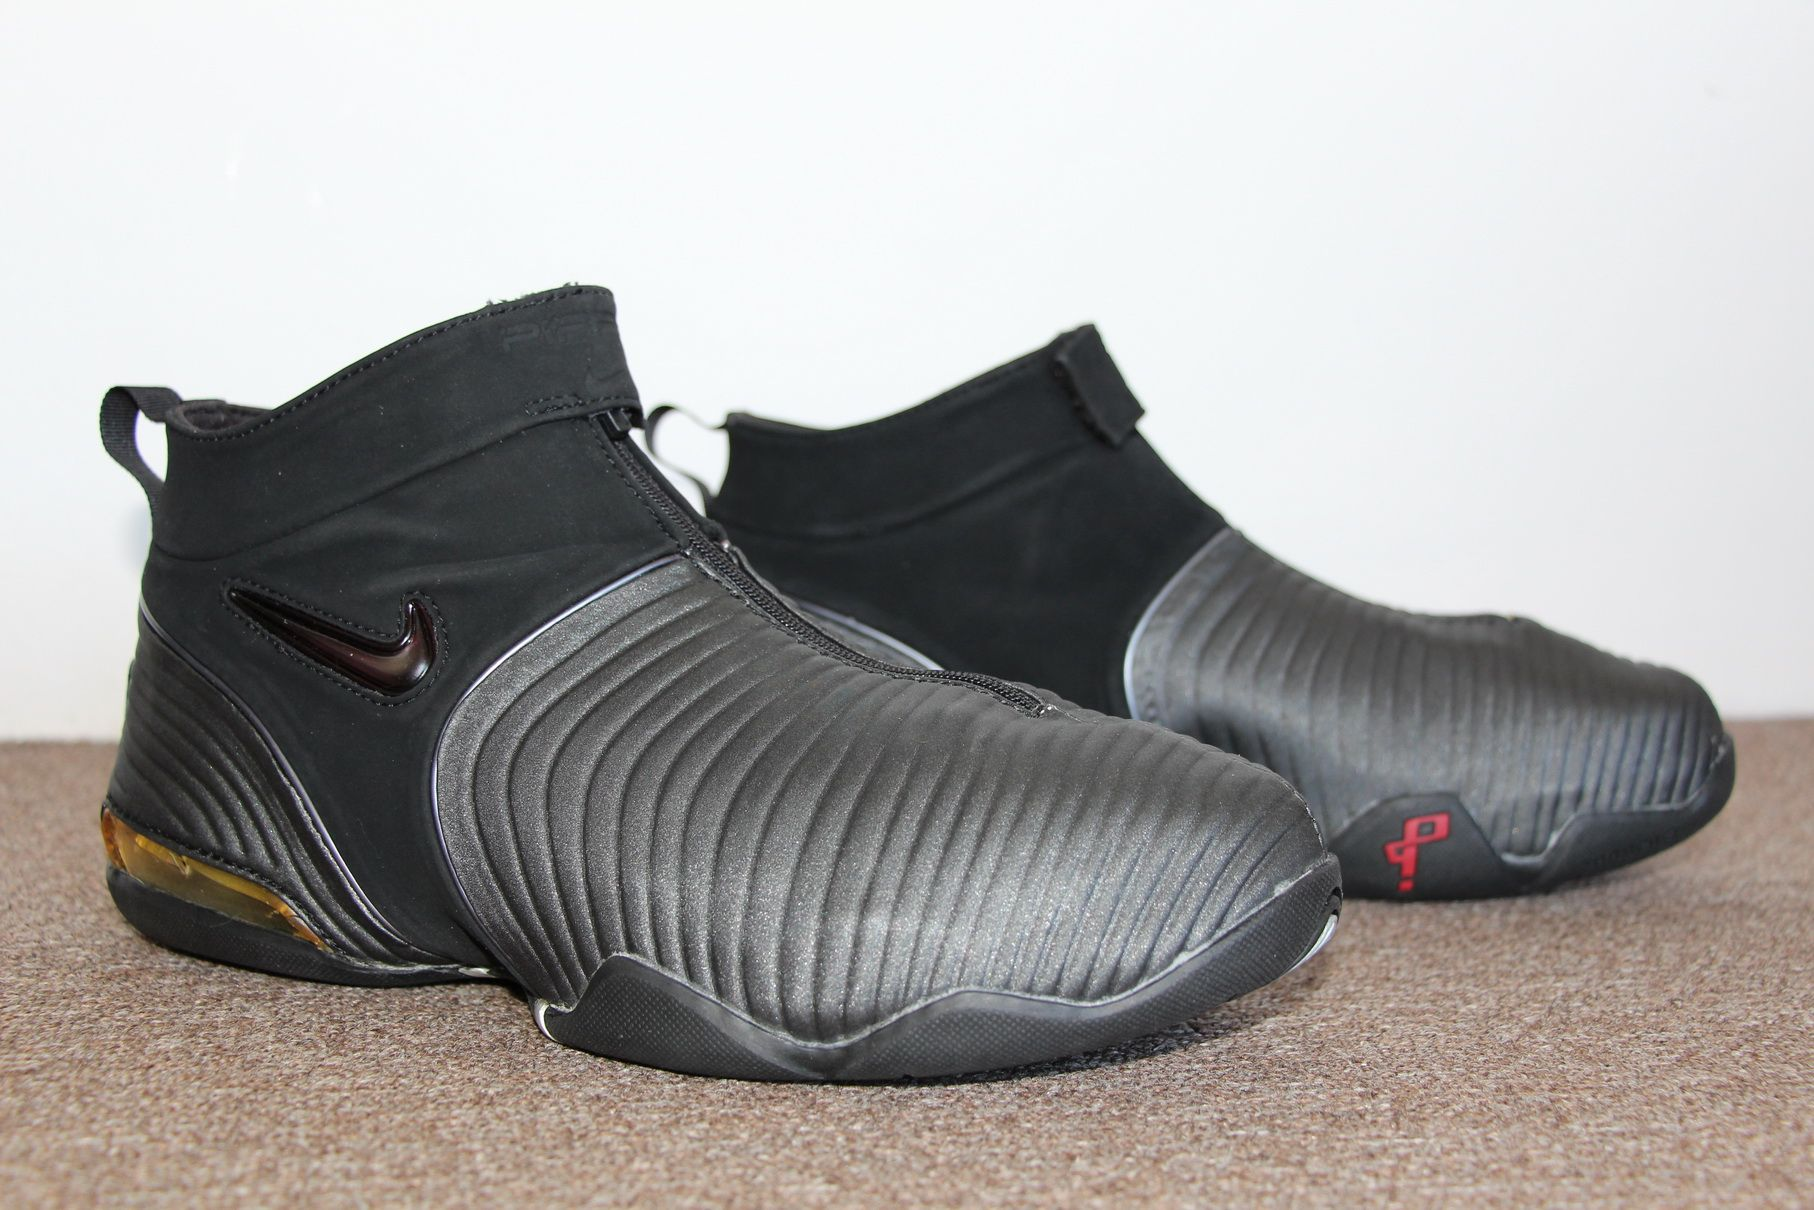 Nike Air Pippen V 2001 (Black/White/Grey)